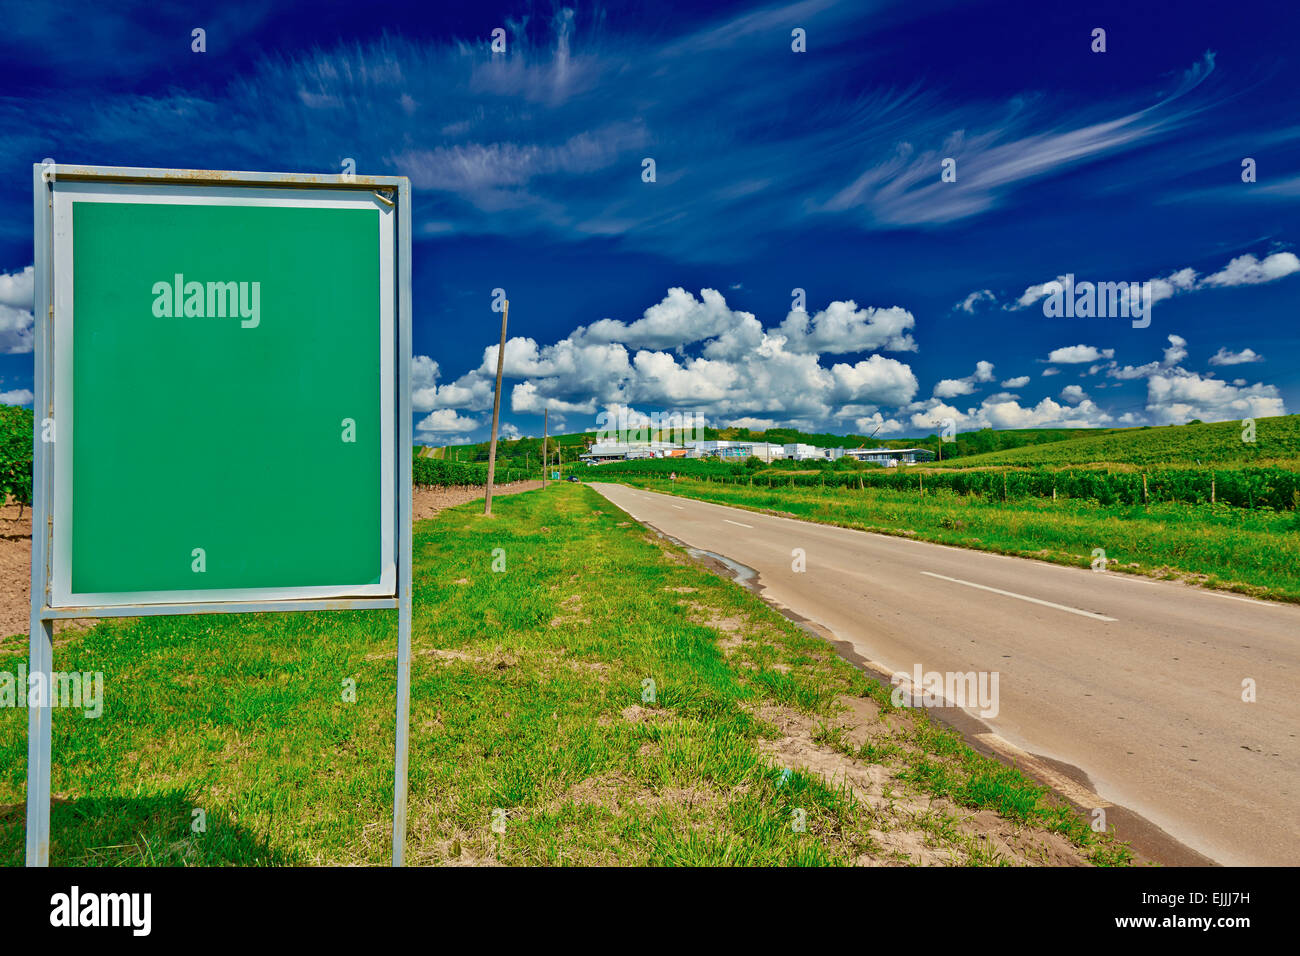 Empty billboard on road at Recas Winery, Romania. - Stock Image